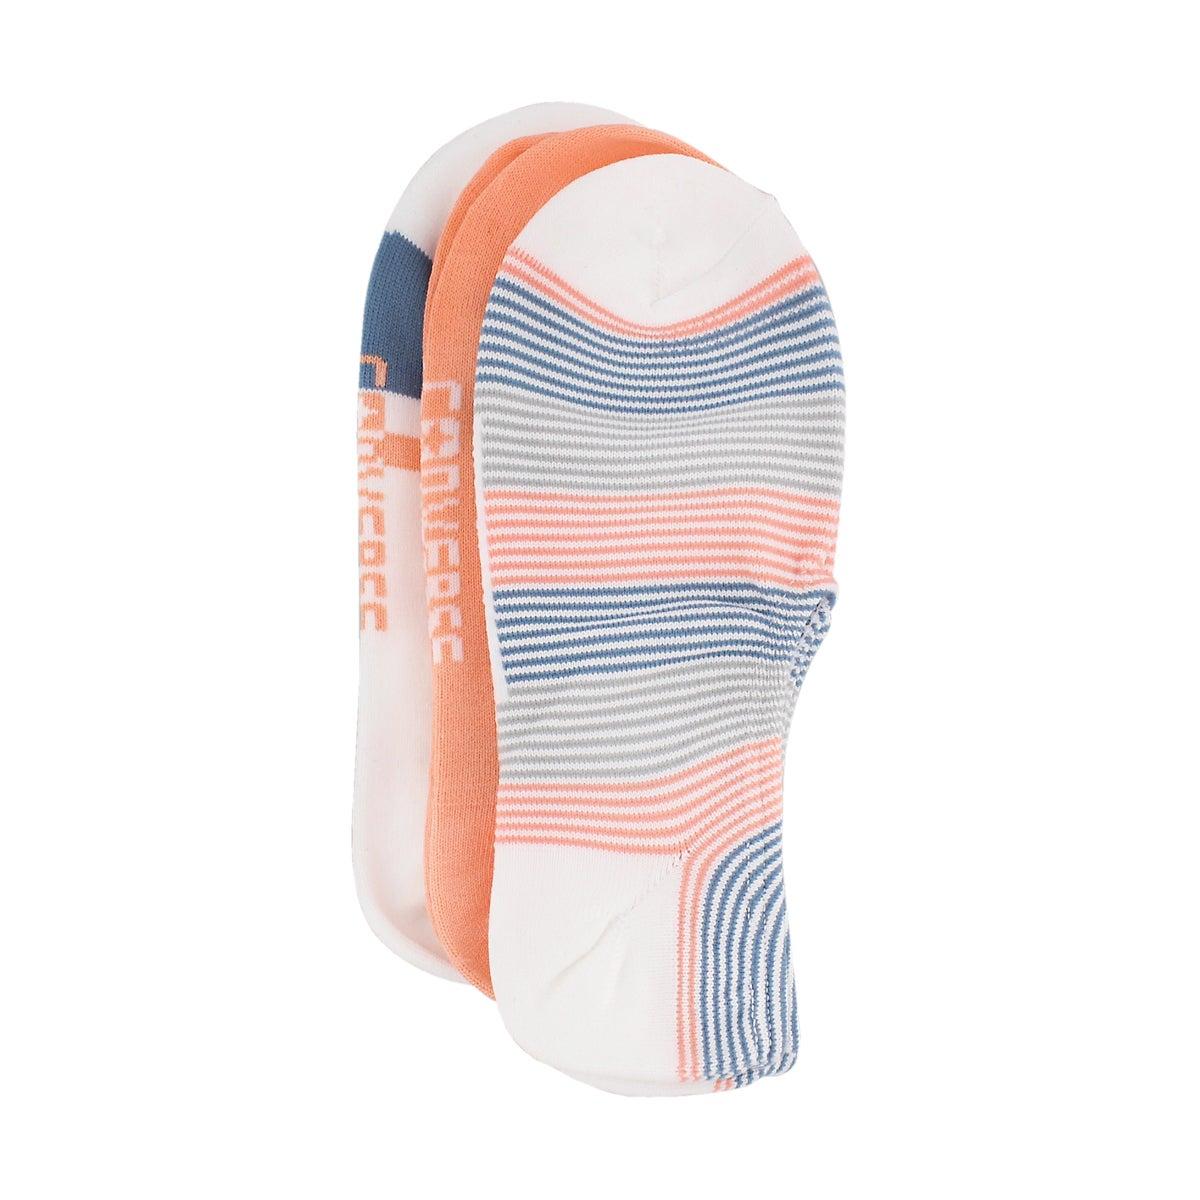 Women's STAHHS-N-STRIPES mulit colour sock- 3 pack